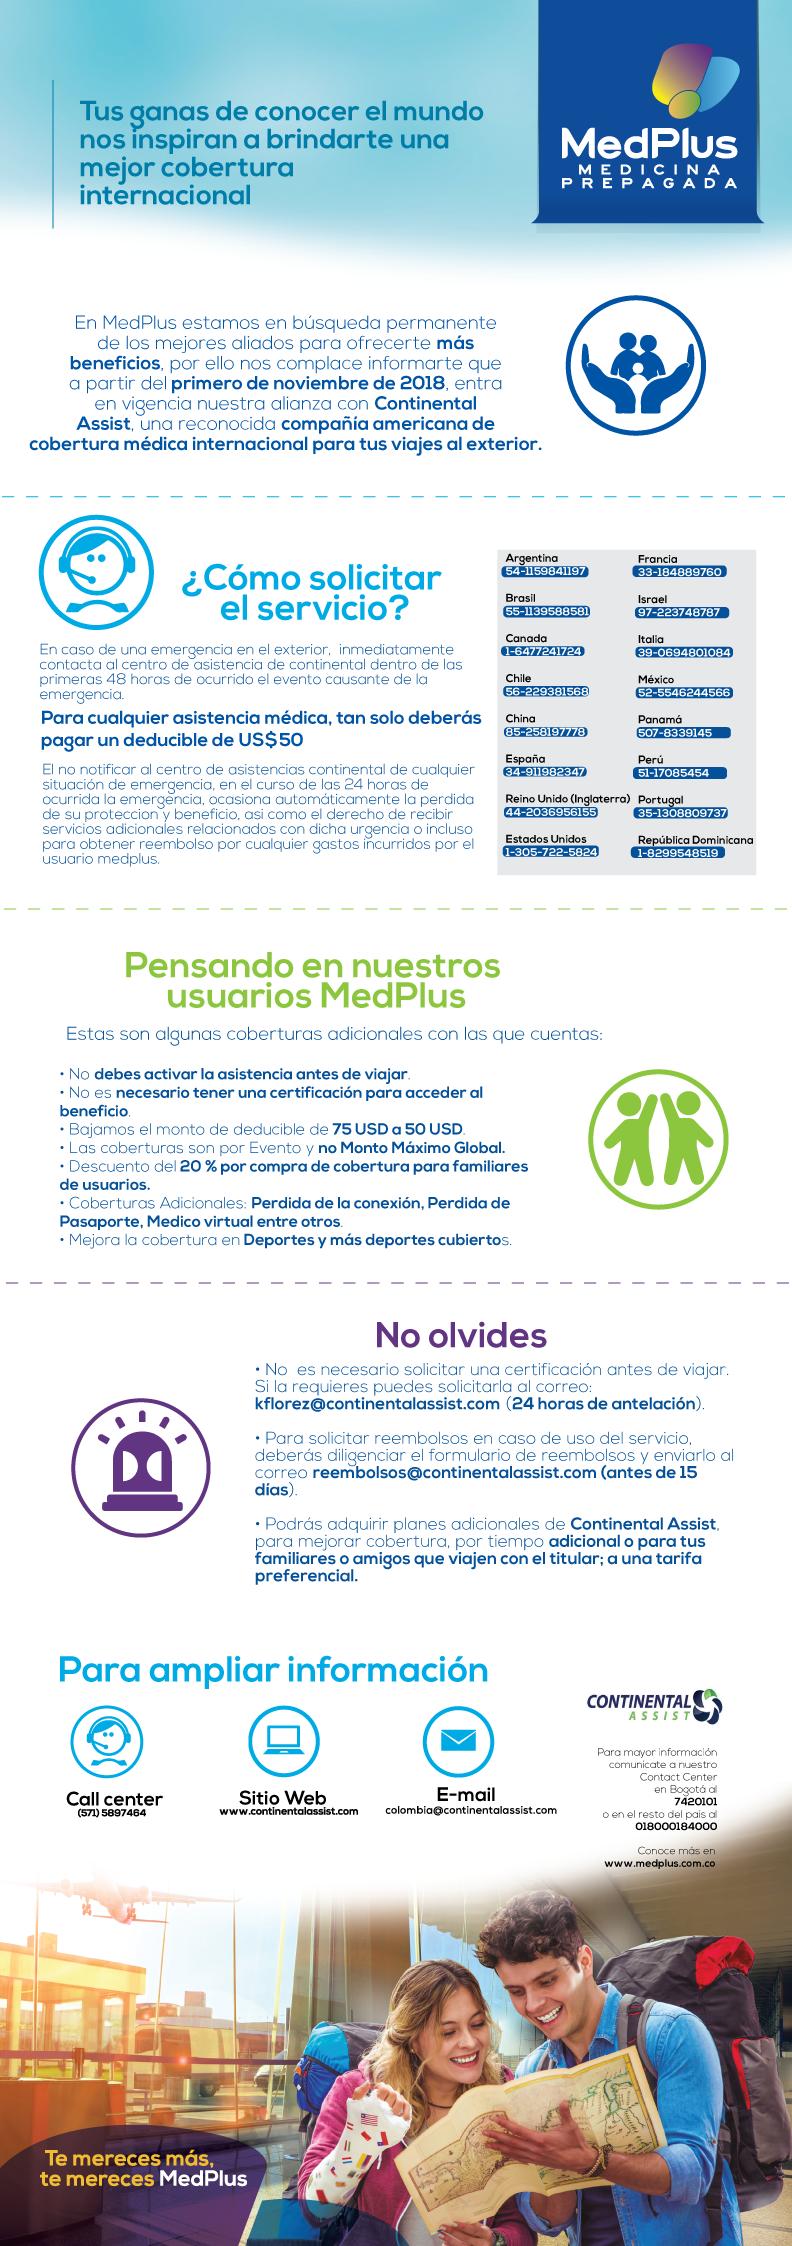 Asistencia médica internacional Continental Assist - MedPlus Medicina Prepagada